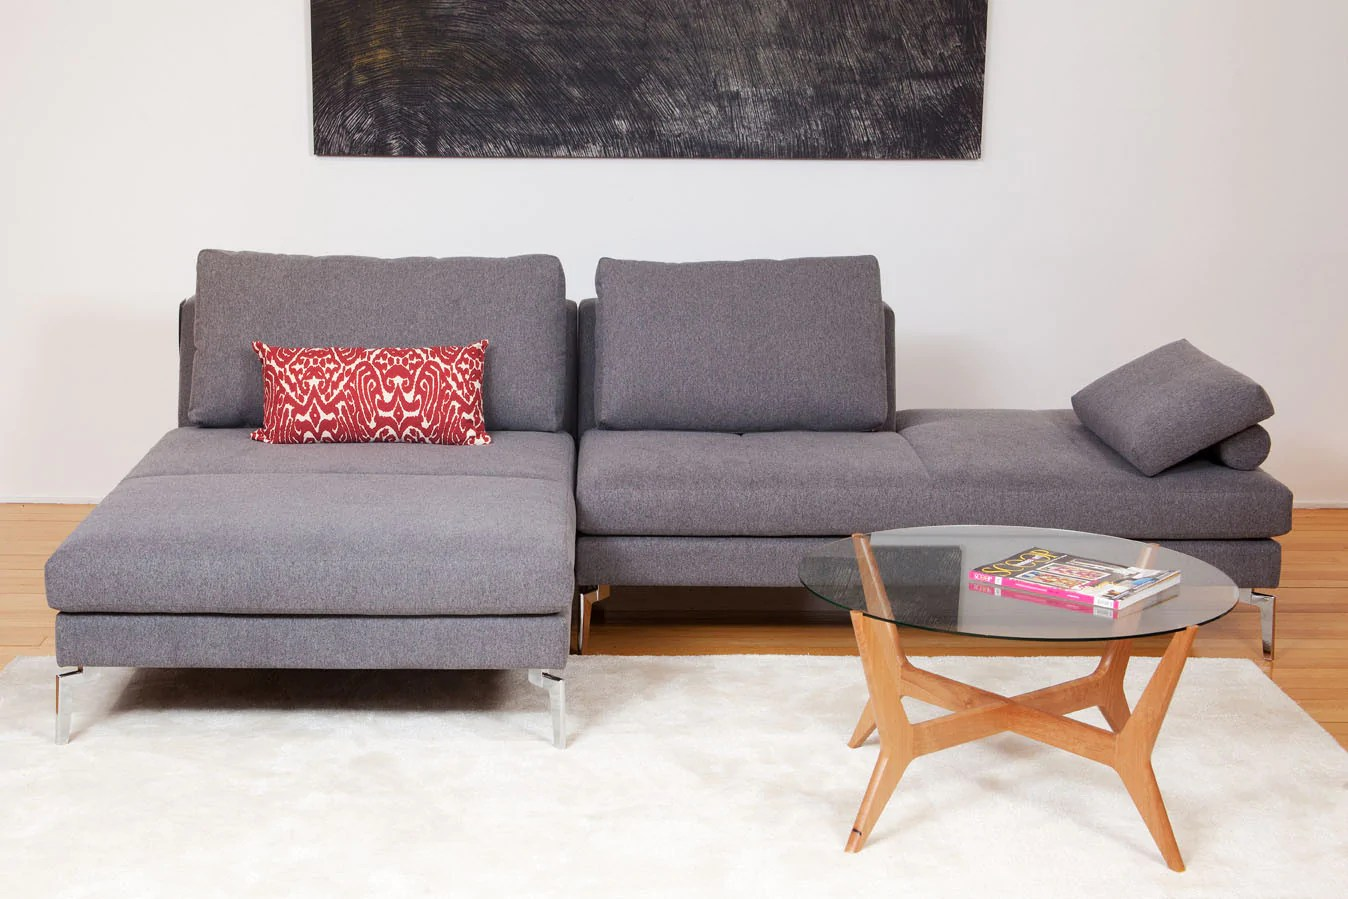 sofa tables perth wa kasala malibu brighton chaise modular fabric or leather couch